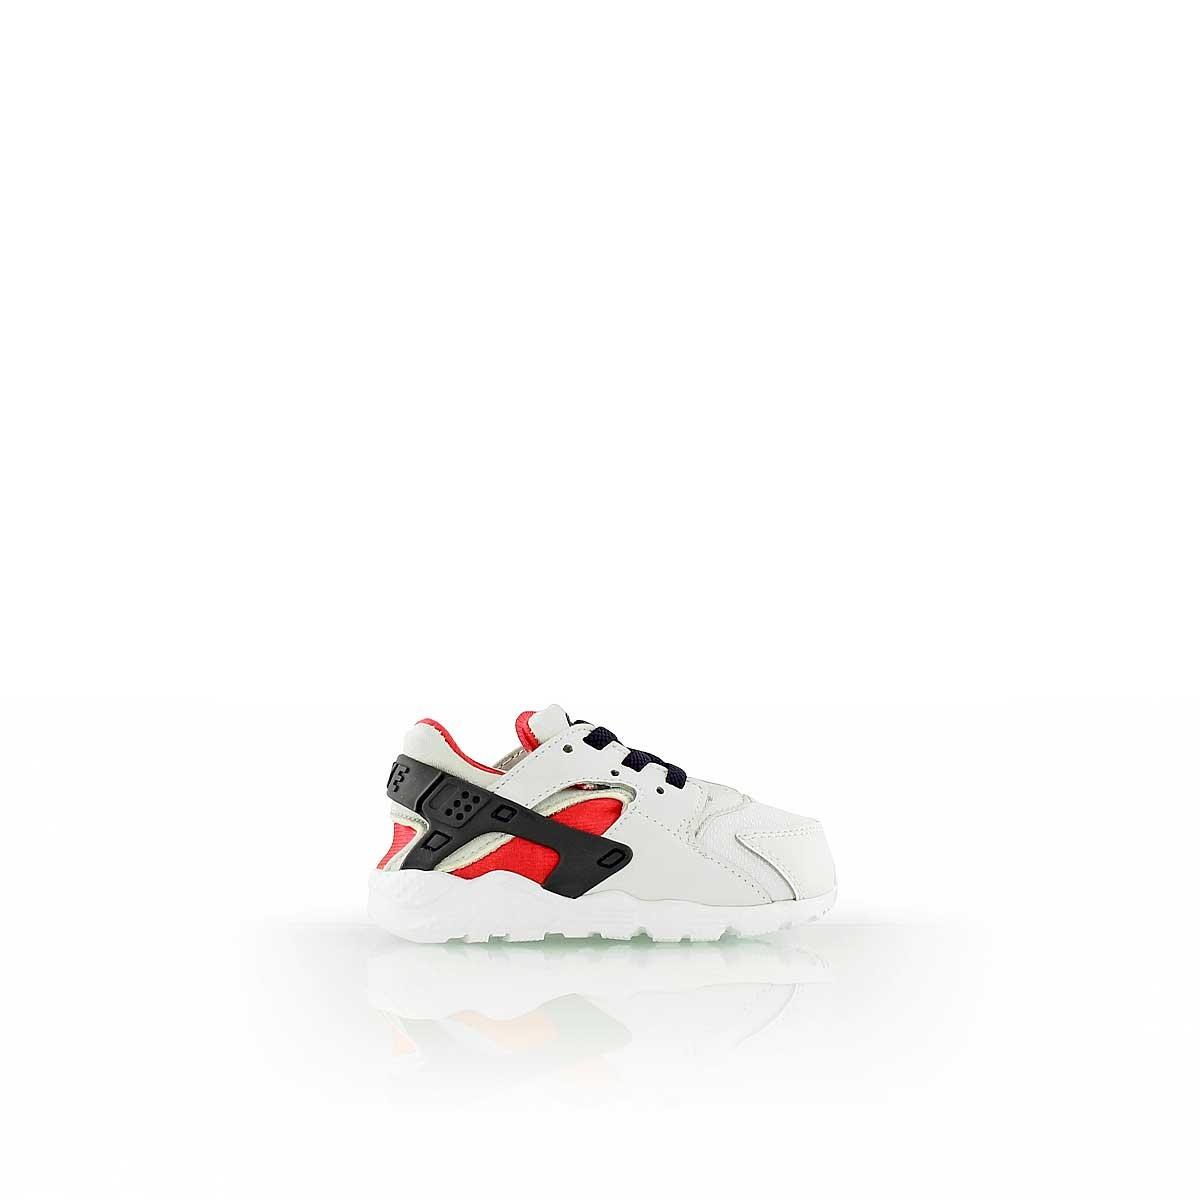 huge selection of 35f23 1abbb Blue Lacci Run Scarpe E Bianco Pelle Huarache 704952 Baby White Nike  1zqxS7zp